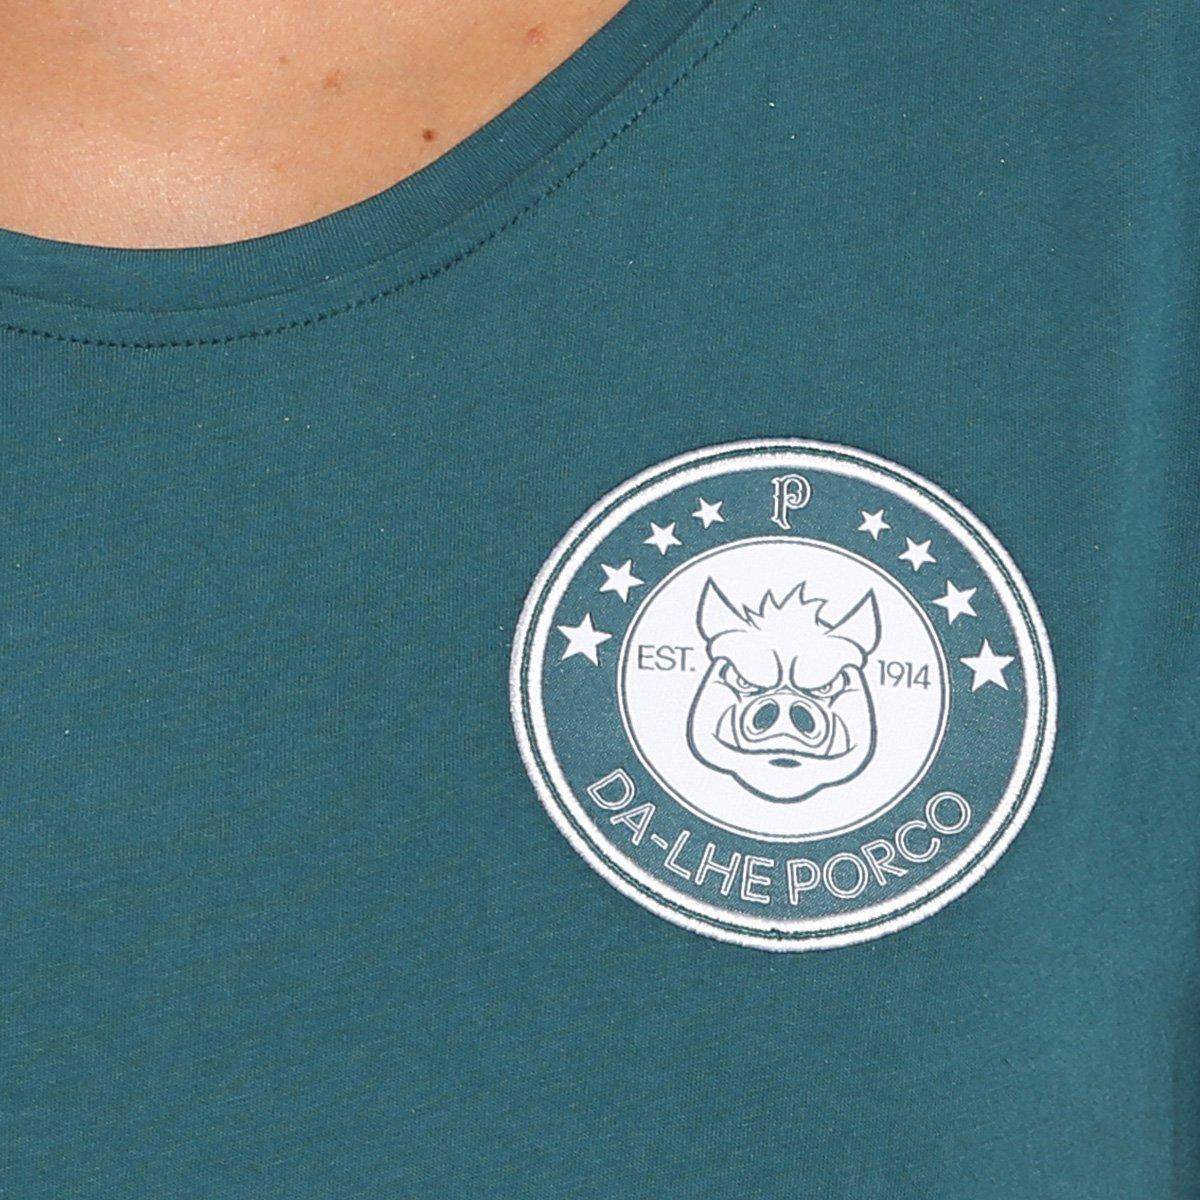 Camiseta Palmeiras Verde 3Stripes 3Stripes Feminina Adidas Palmeiras Camiseta Adidas Feminina Palmeiras Verde Adidas Camiseta AEWddZcBq